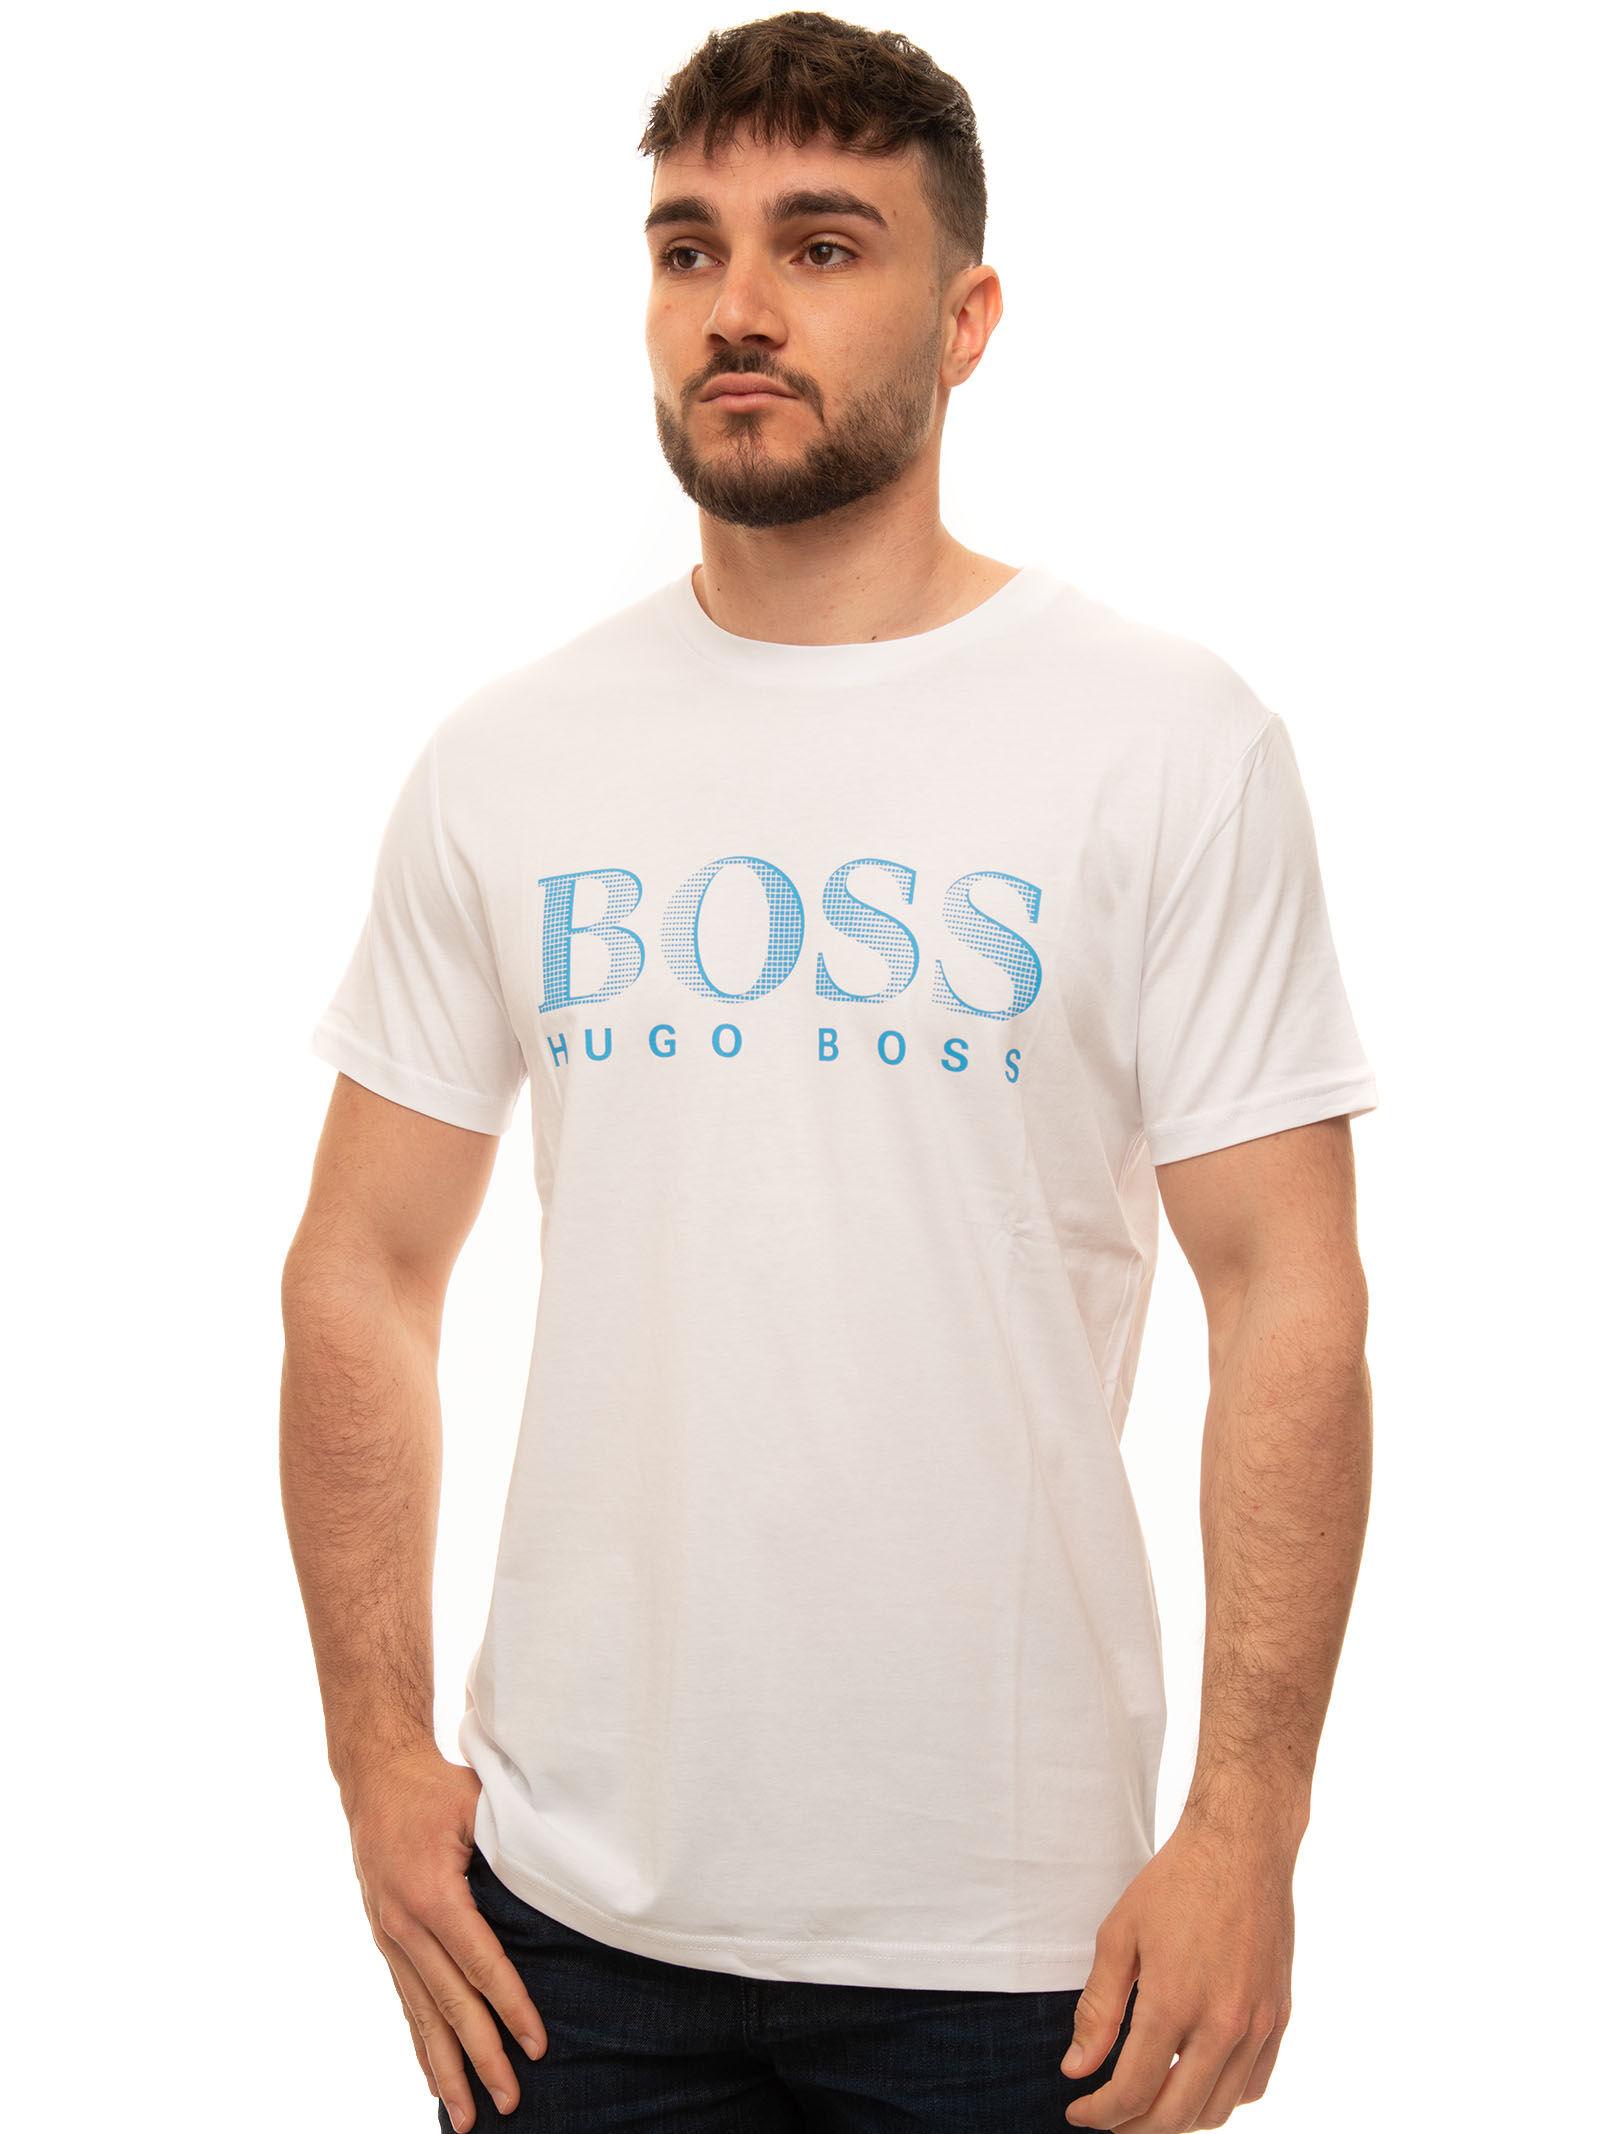 Boss T-shirt girocollo mezza manica Bianco Cotone Uomo